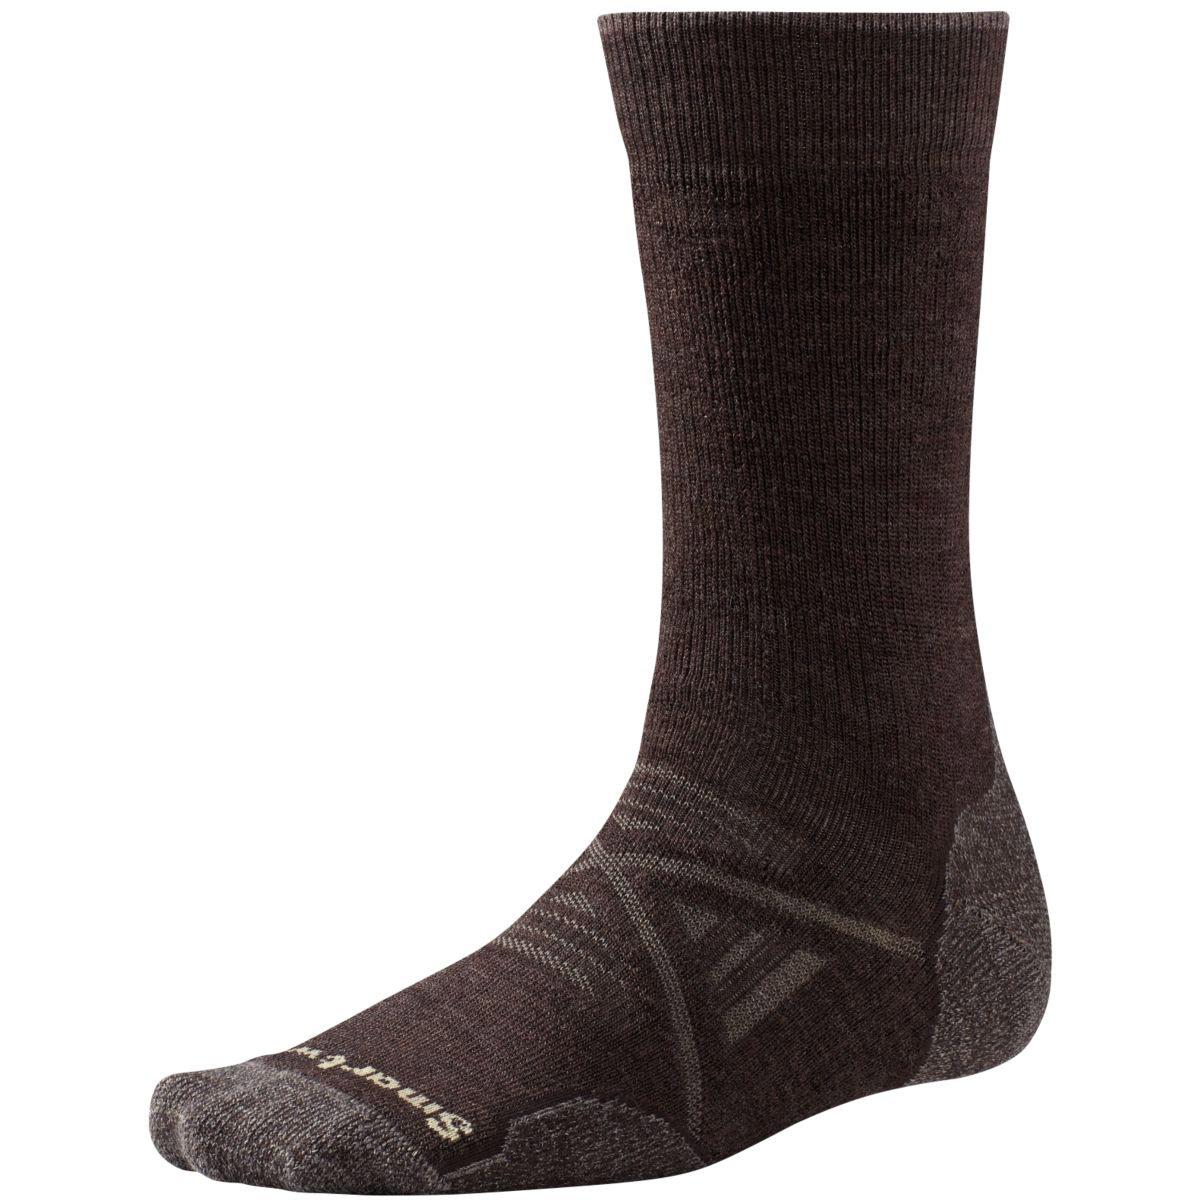 Smartwool Men's Phd Outdoor Medium Crew Socks - Brown, XL